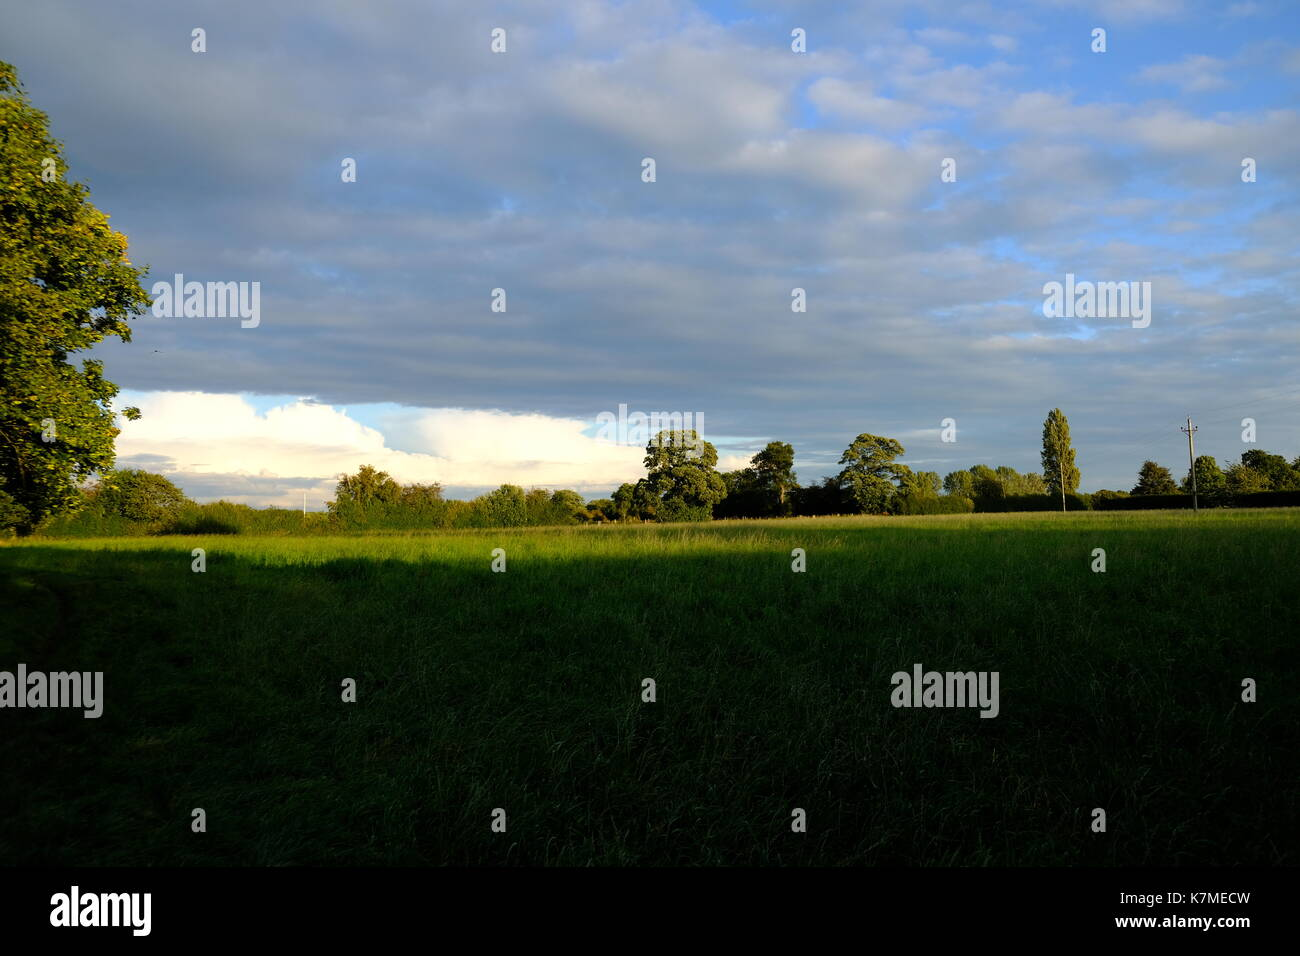 Rural life - Stock Image